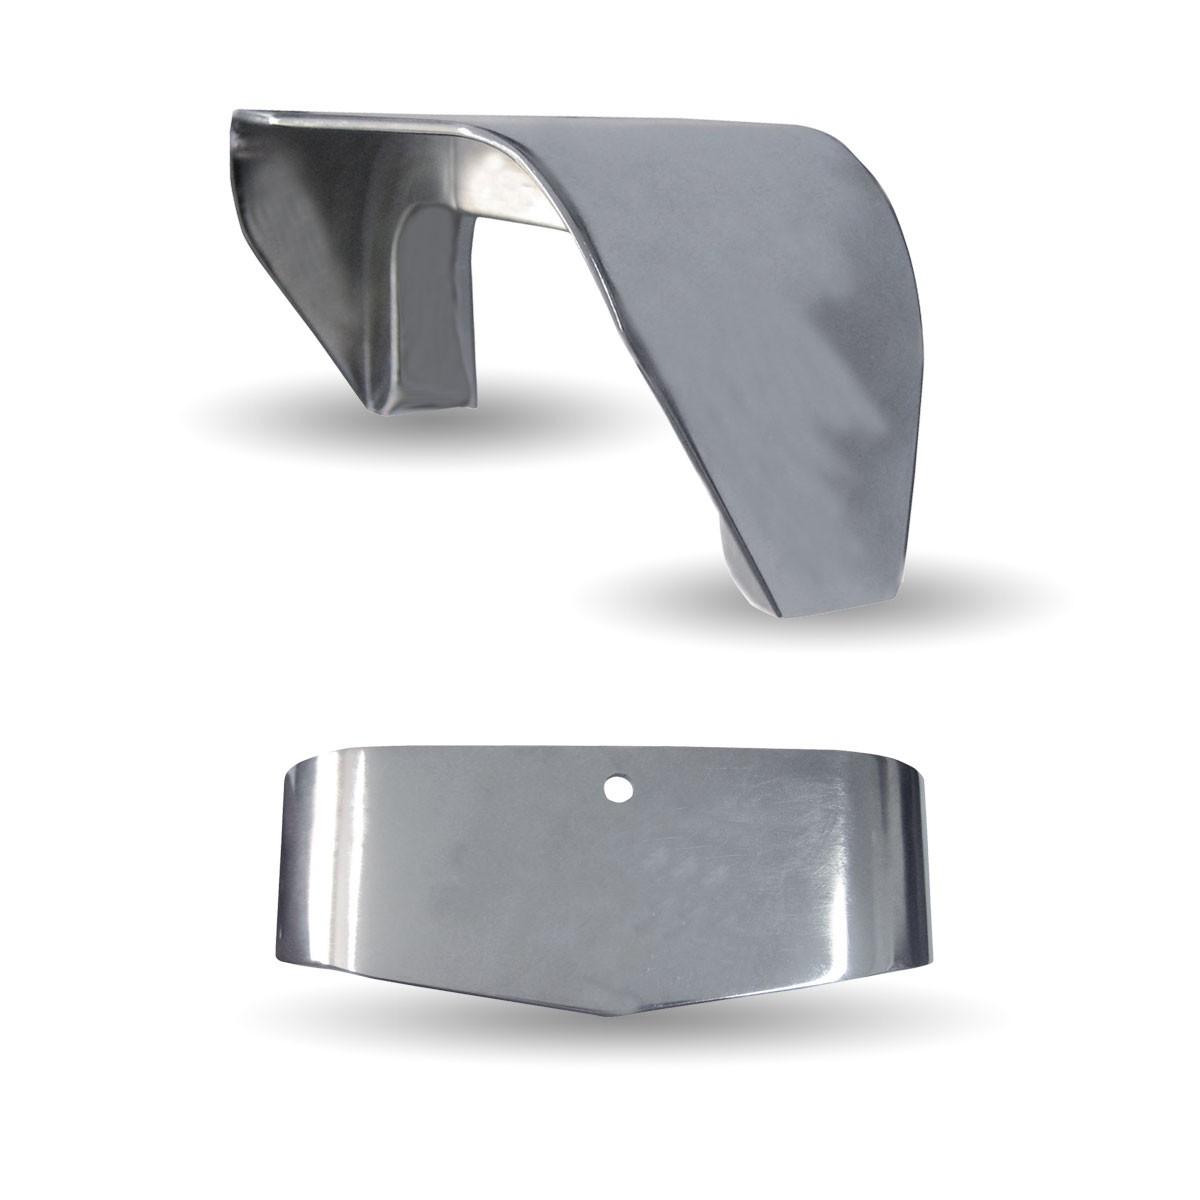 Westcoast mirror visor accessories universal mirrors for Mirror visor